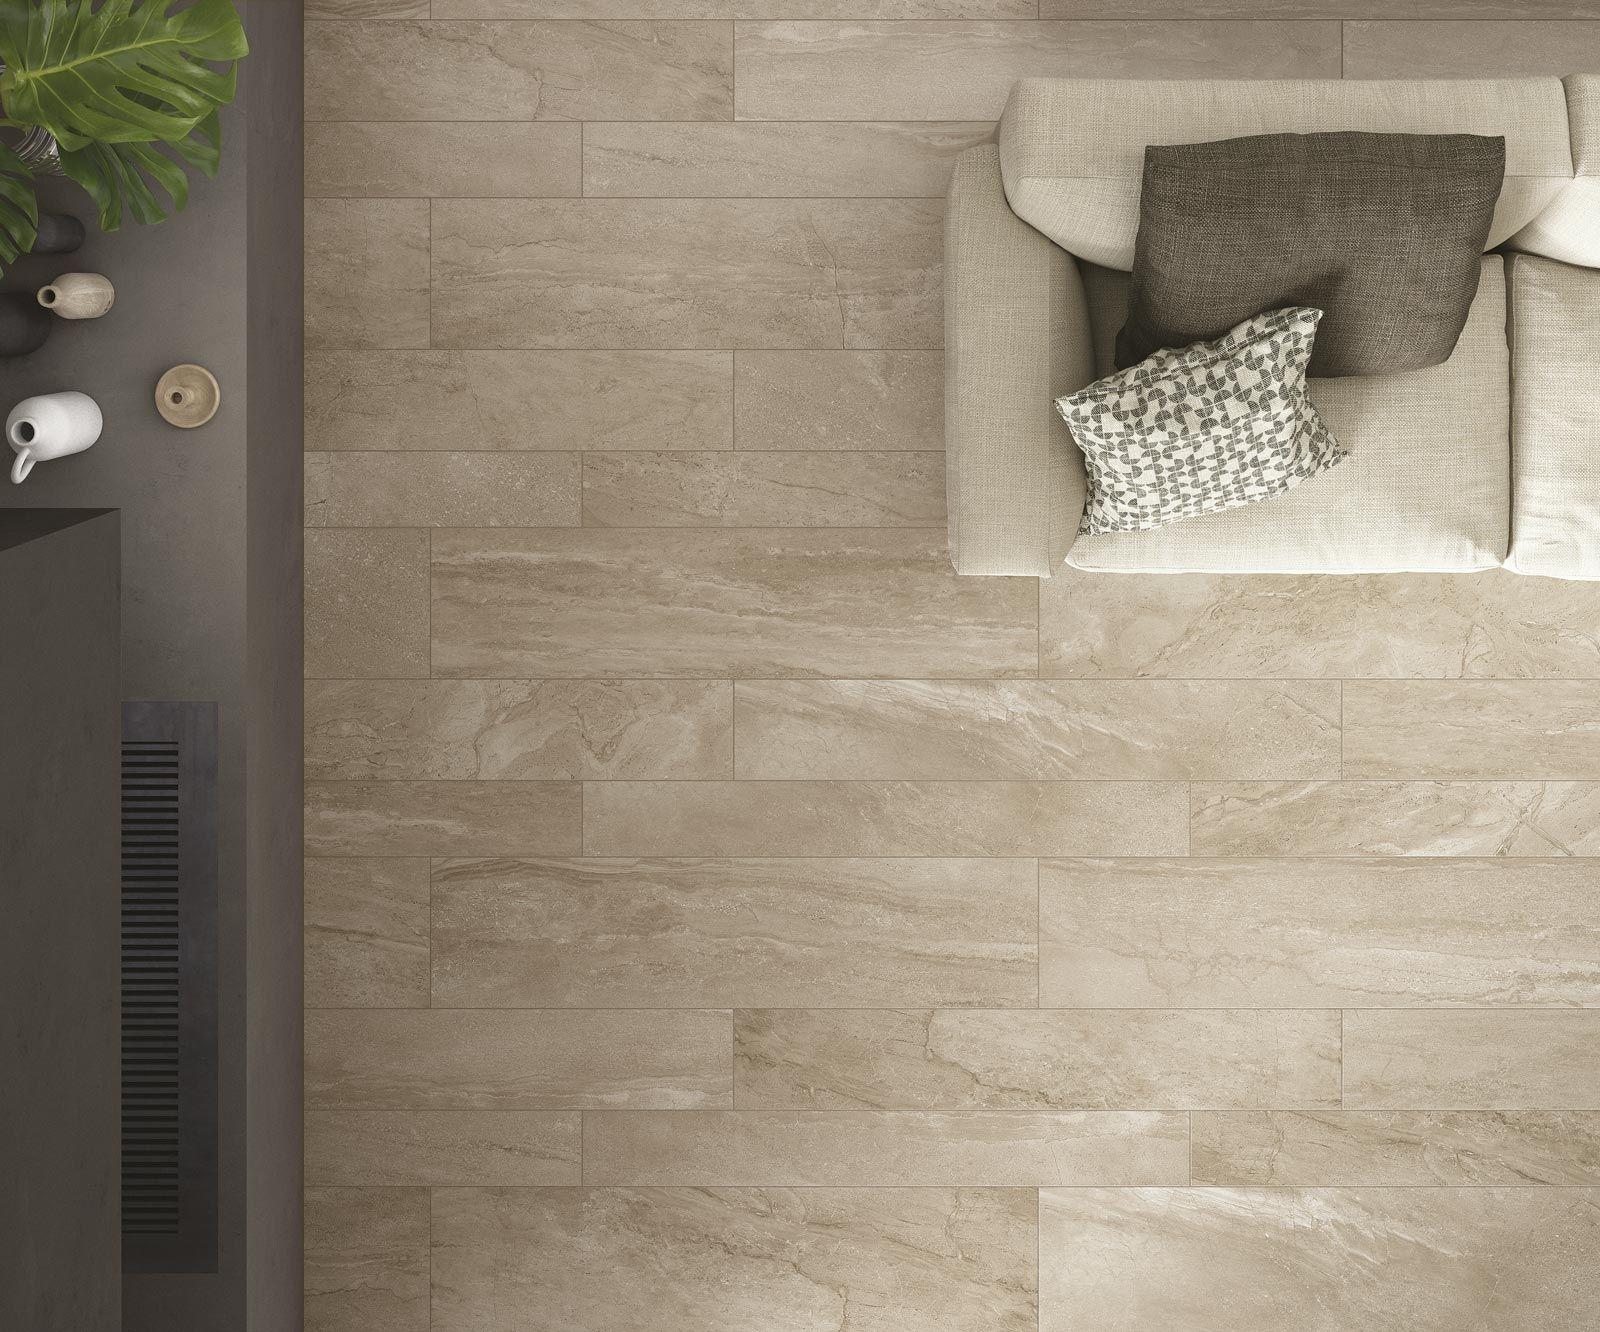 Badezimmerspiegel Bauhaus ~ Symphony collection: marble effect stoneware tiles ragno ragno